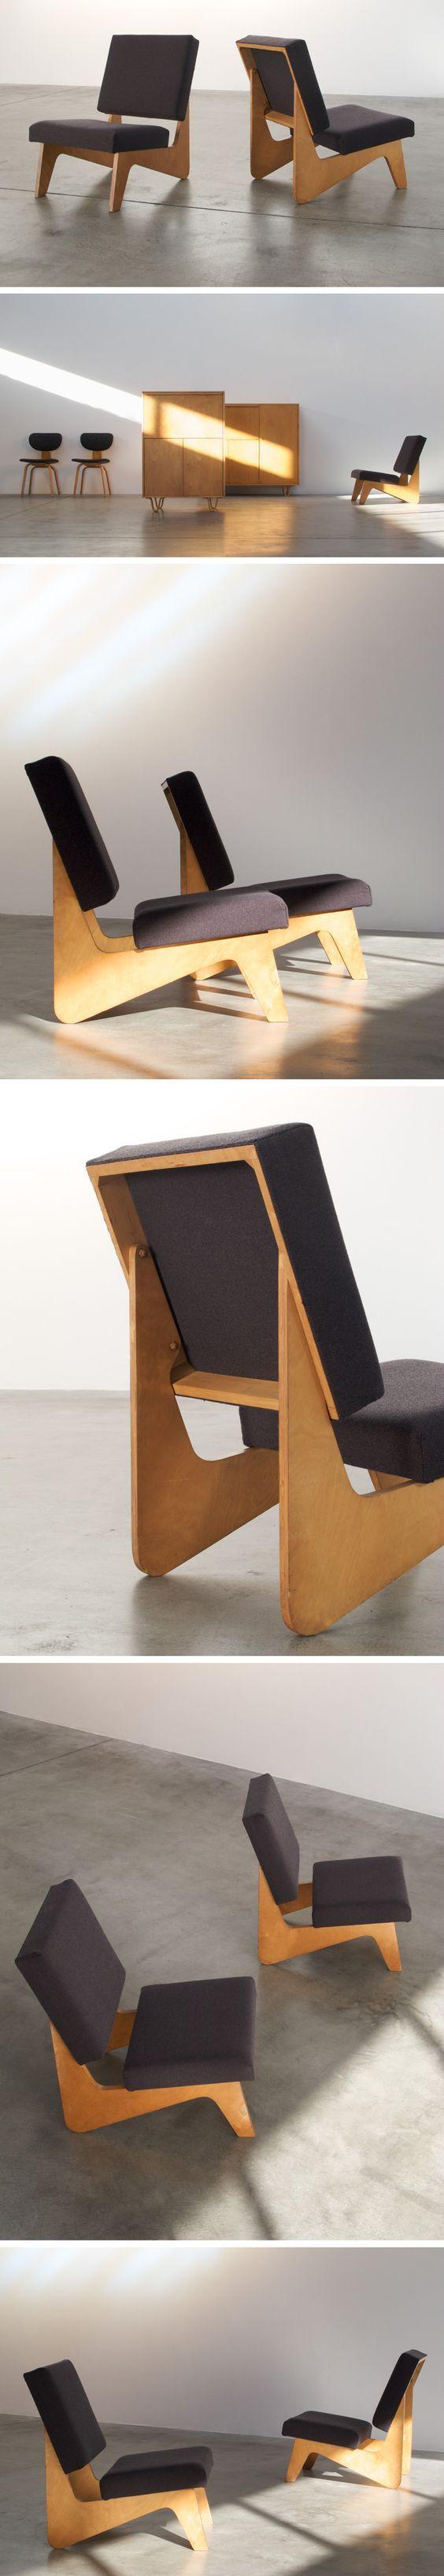 Cees Braakman pair of FB03 lounge chairs Combex series: